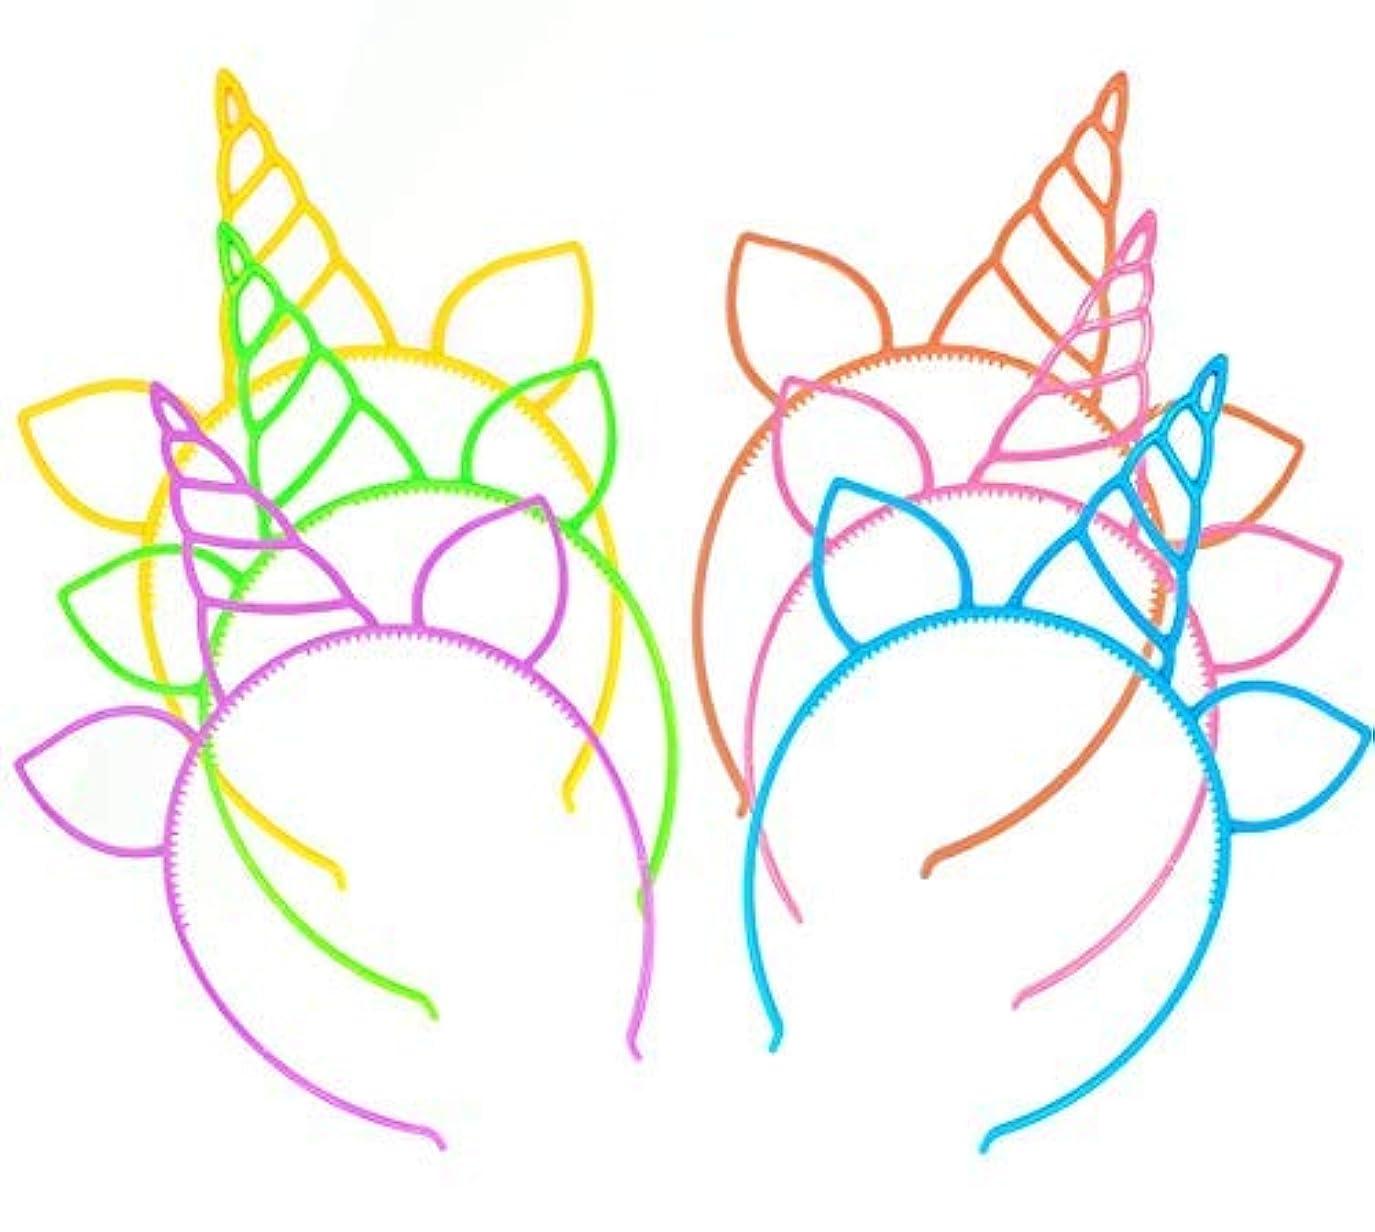 12 Pcs Unicorn Headbands Theme Birthday Party Favor Supplies Gift Costume [並行輸入品]